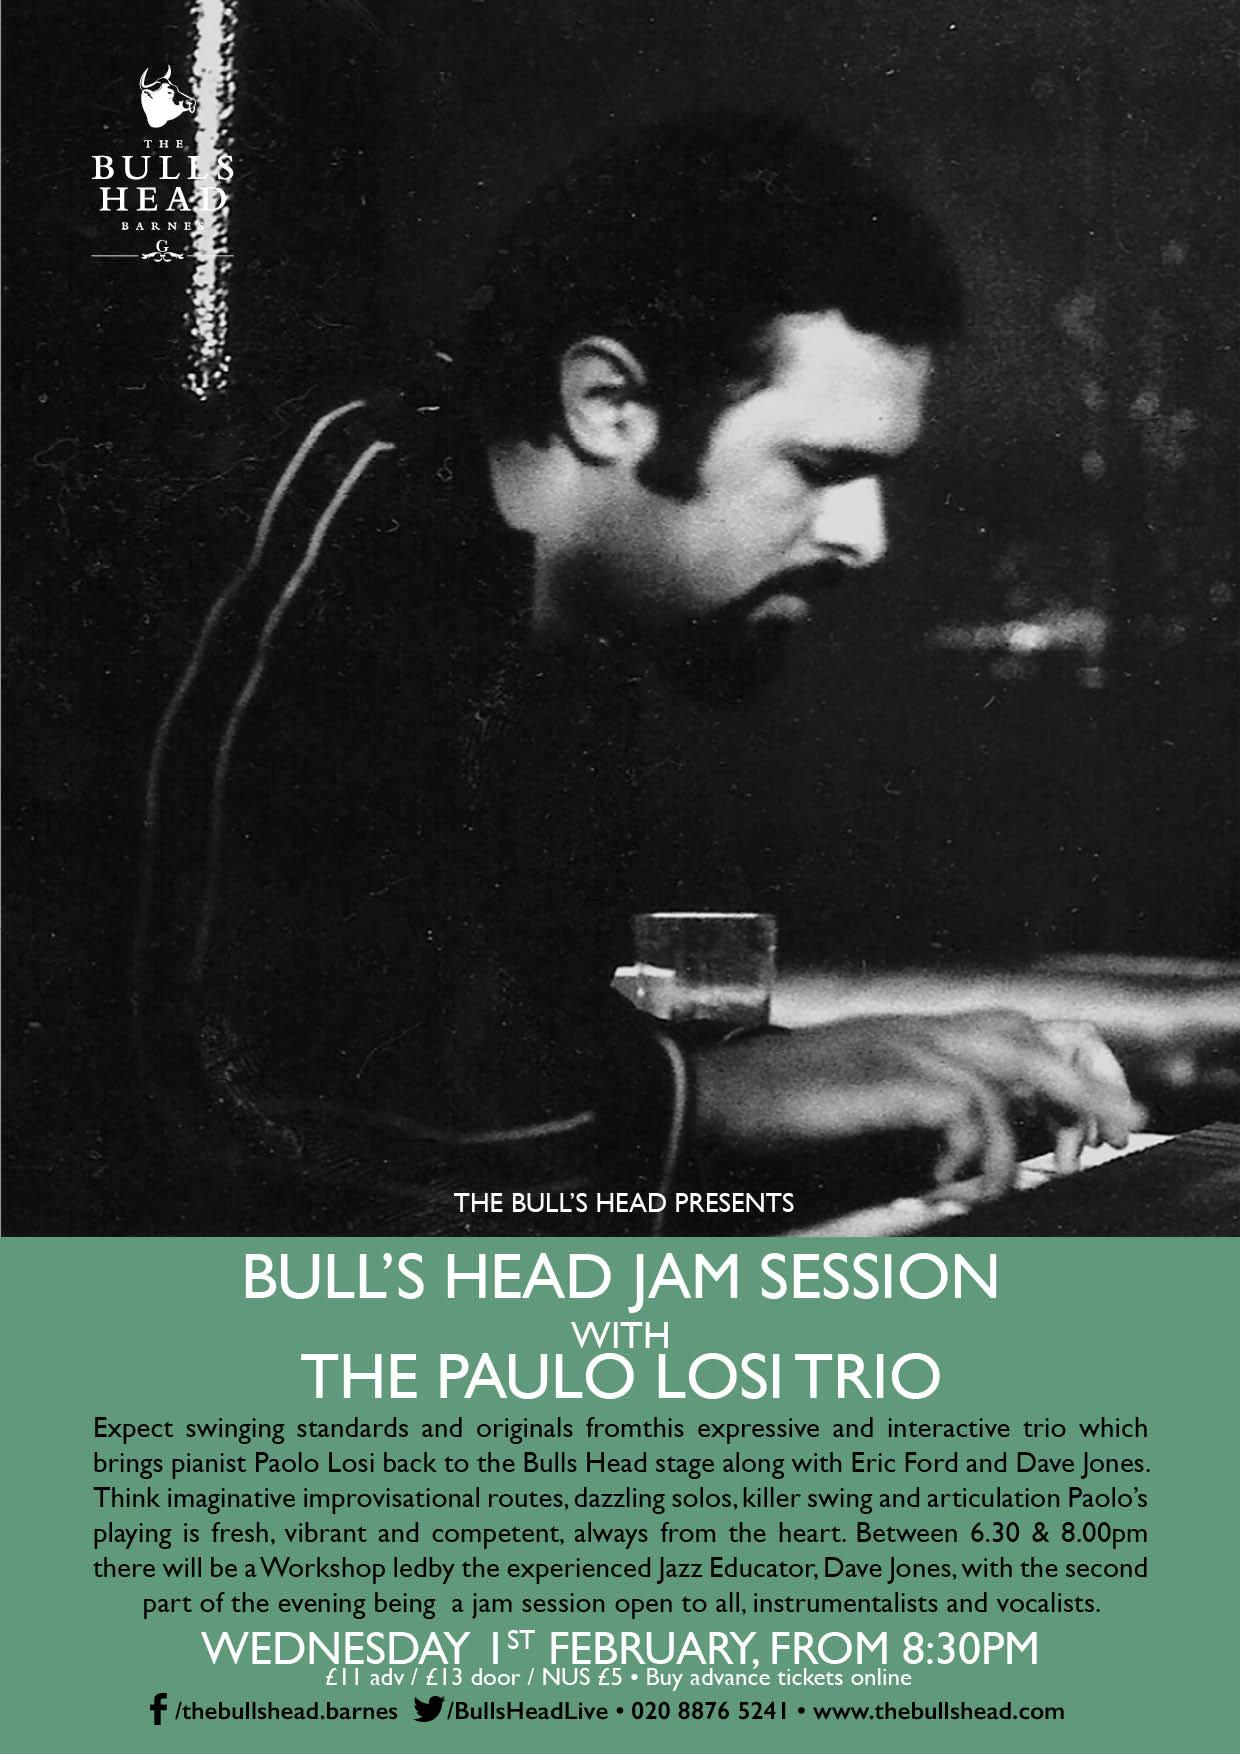 Paolo Losi Trio host The Bull's Head Jam Session